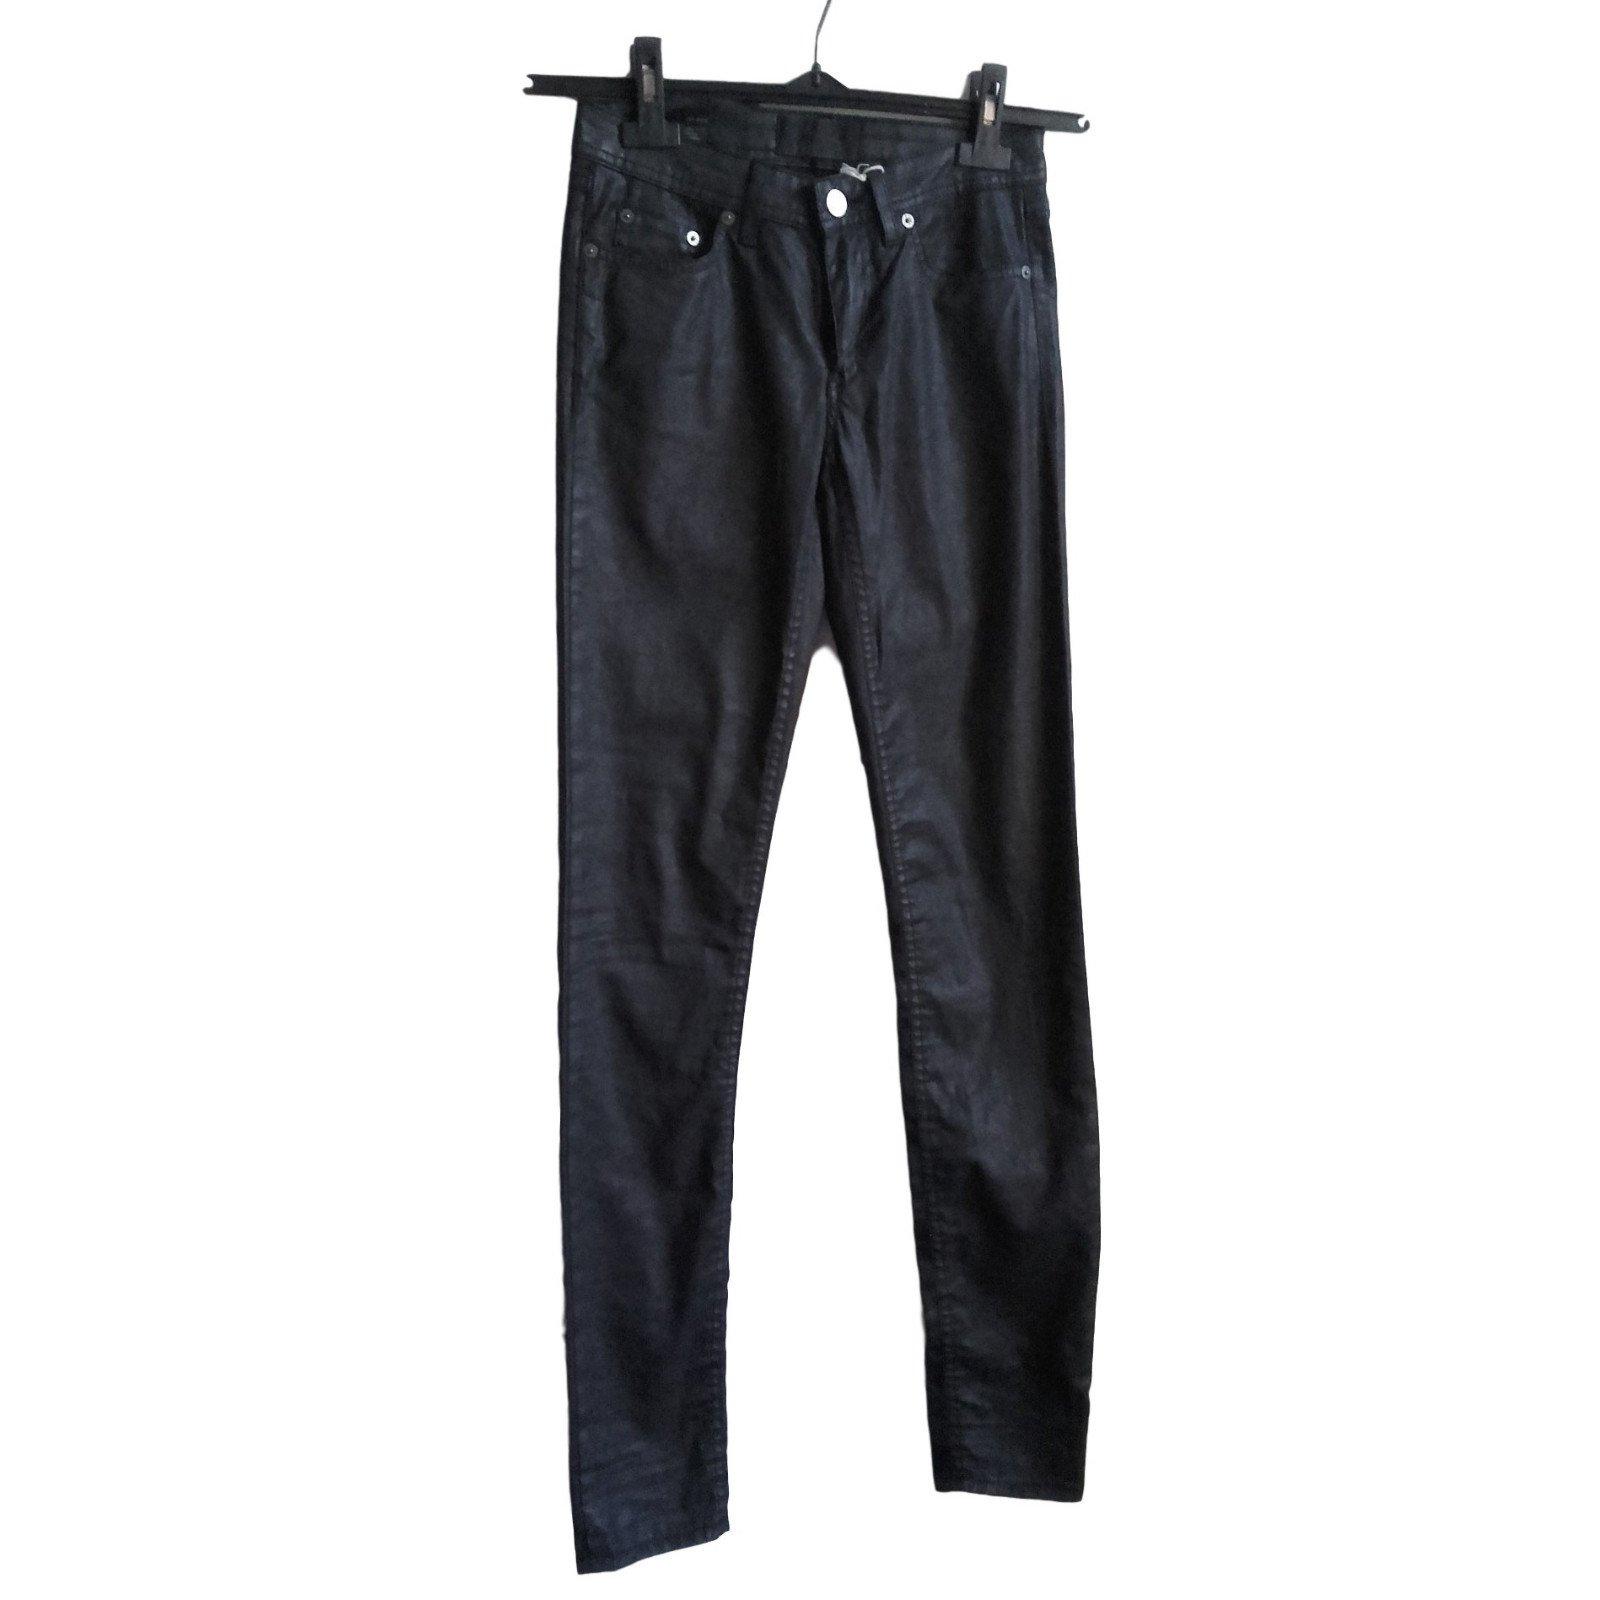 2a86b0dd24bf Acne Jean Acné Studio, never worn Pants, leggings Cotton Dark grey ref.38515